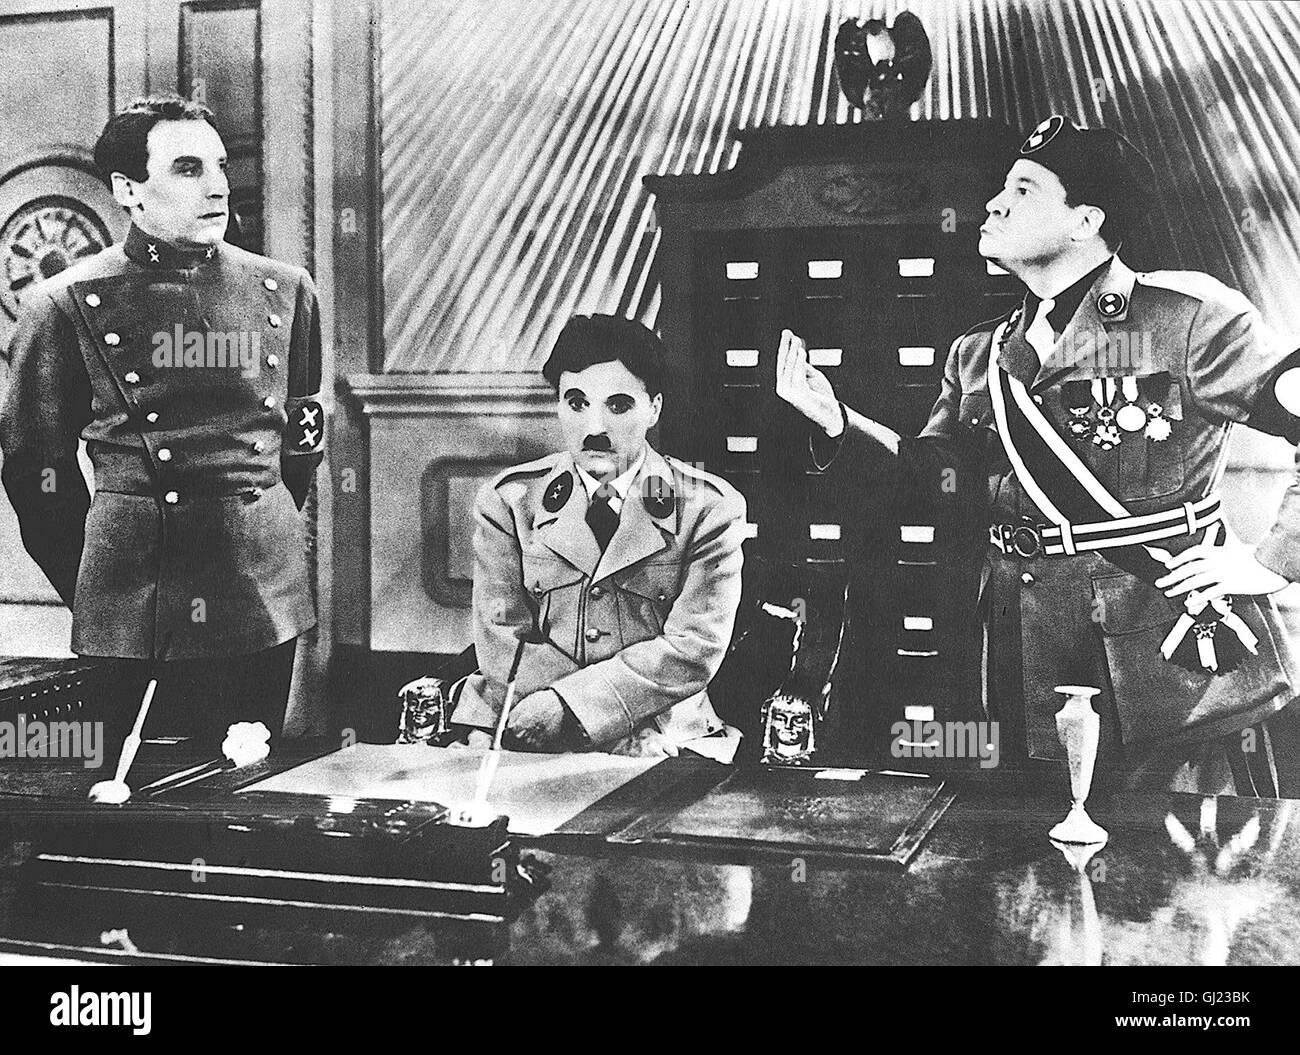 der grosse diktator the great dictator usa 1940 - charles